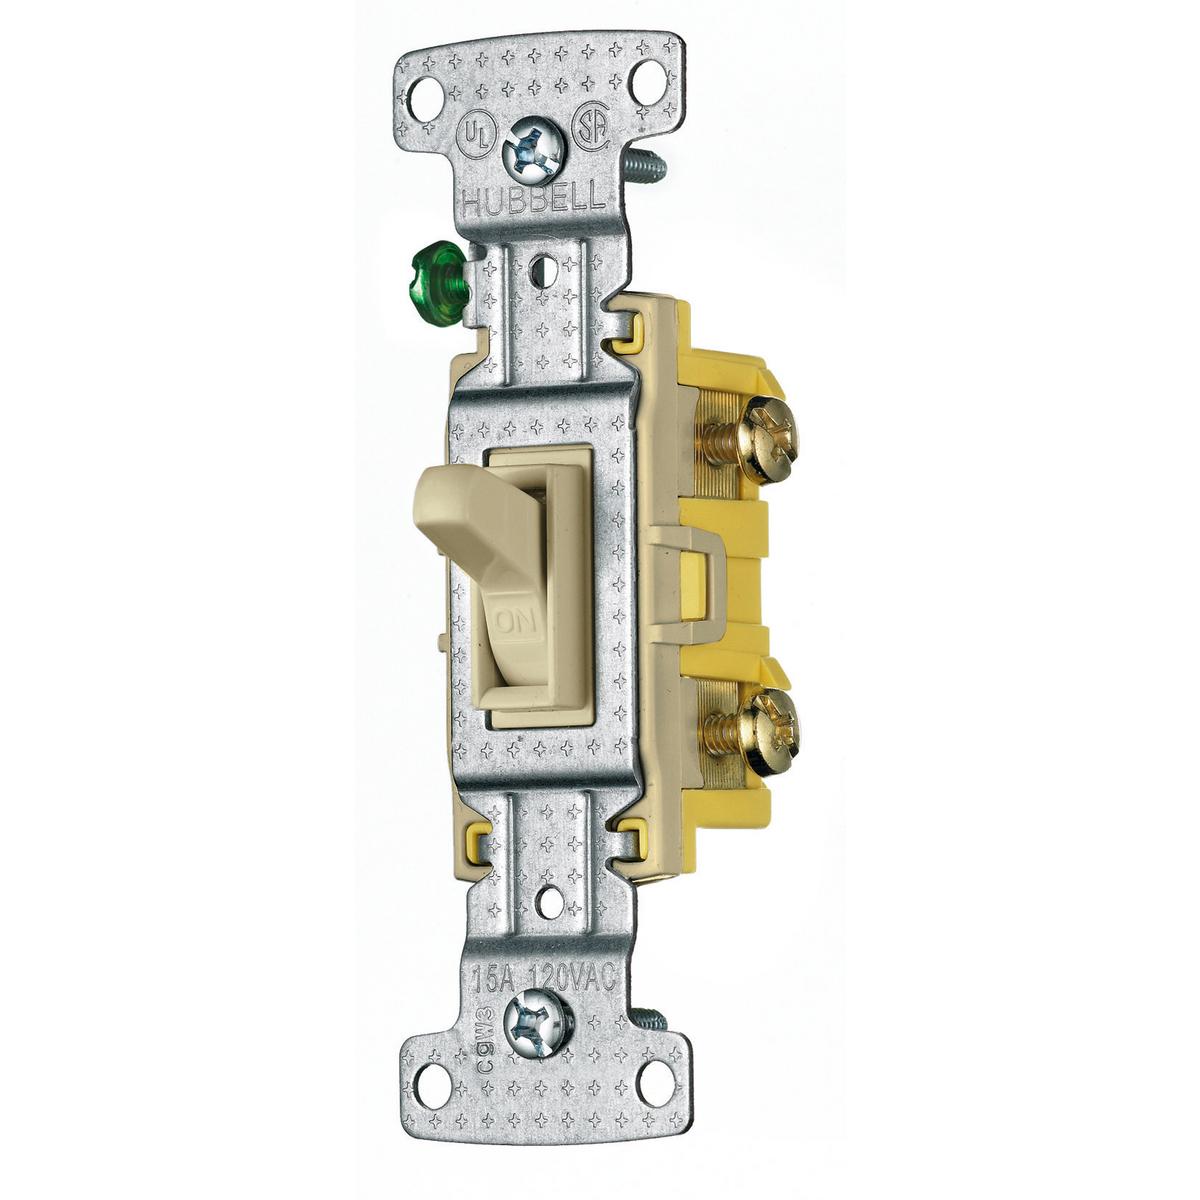 Hubbell RS115ILI 15 Amp 120 VAC 1-Pole Ivory Toggle Switch